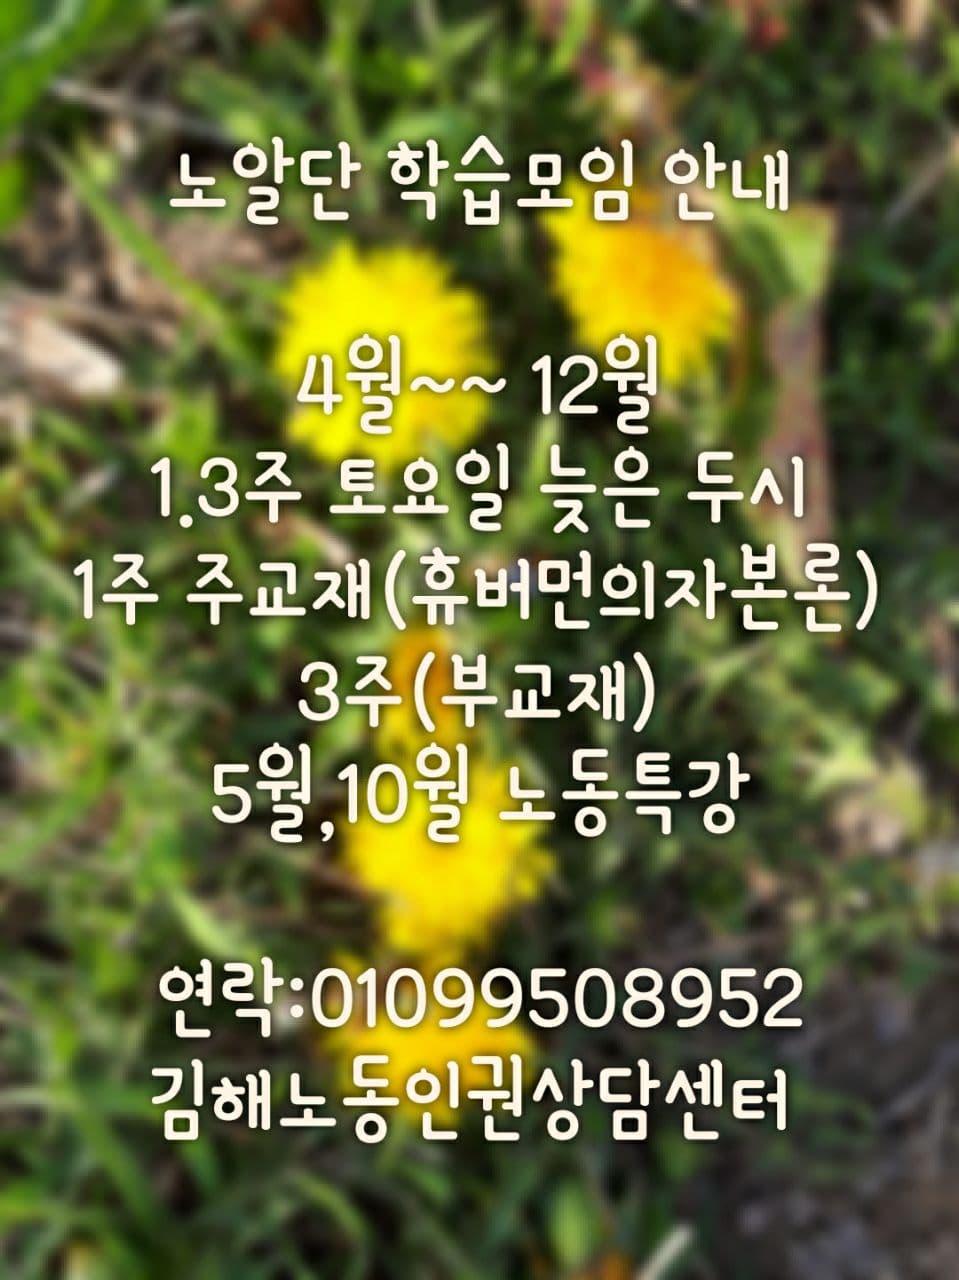 photo_2021-03-29_23-56-54.jpg